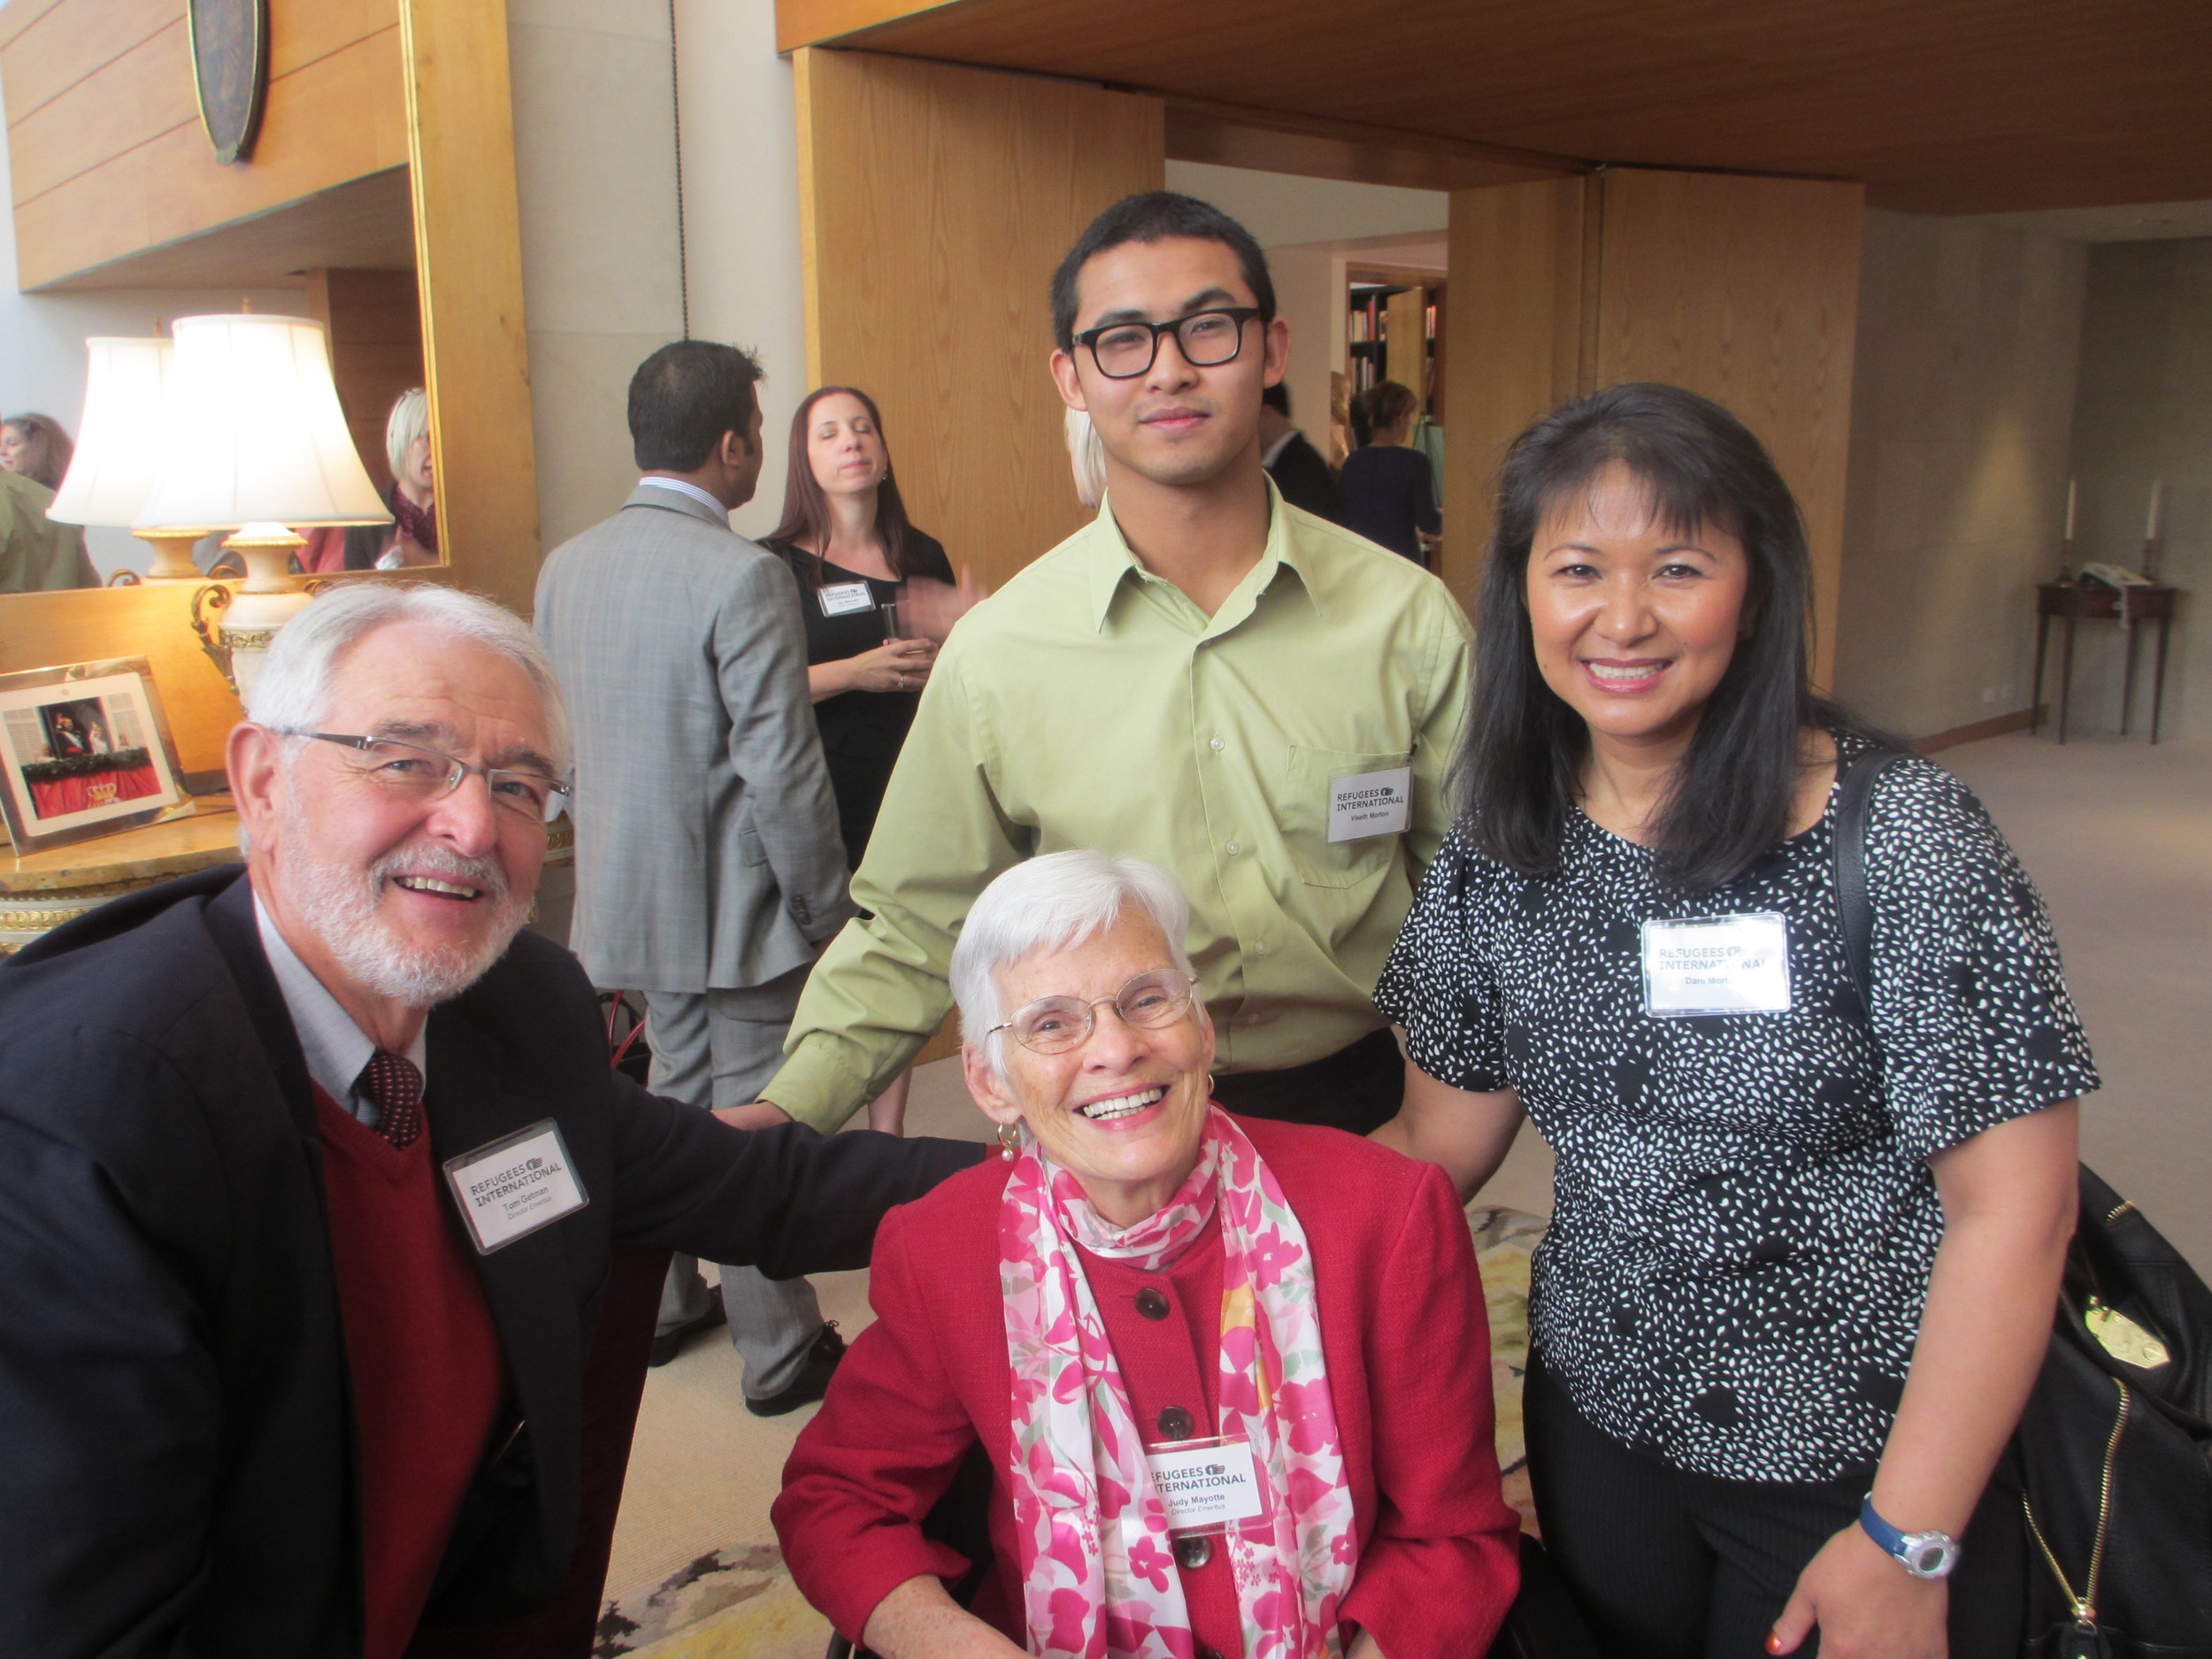 RI Director Emeritus Tom Getman, Viseth Morton, Director Emeritus Judy Mayotte and Dani Morton